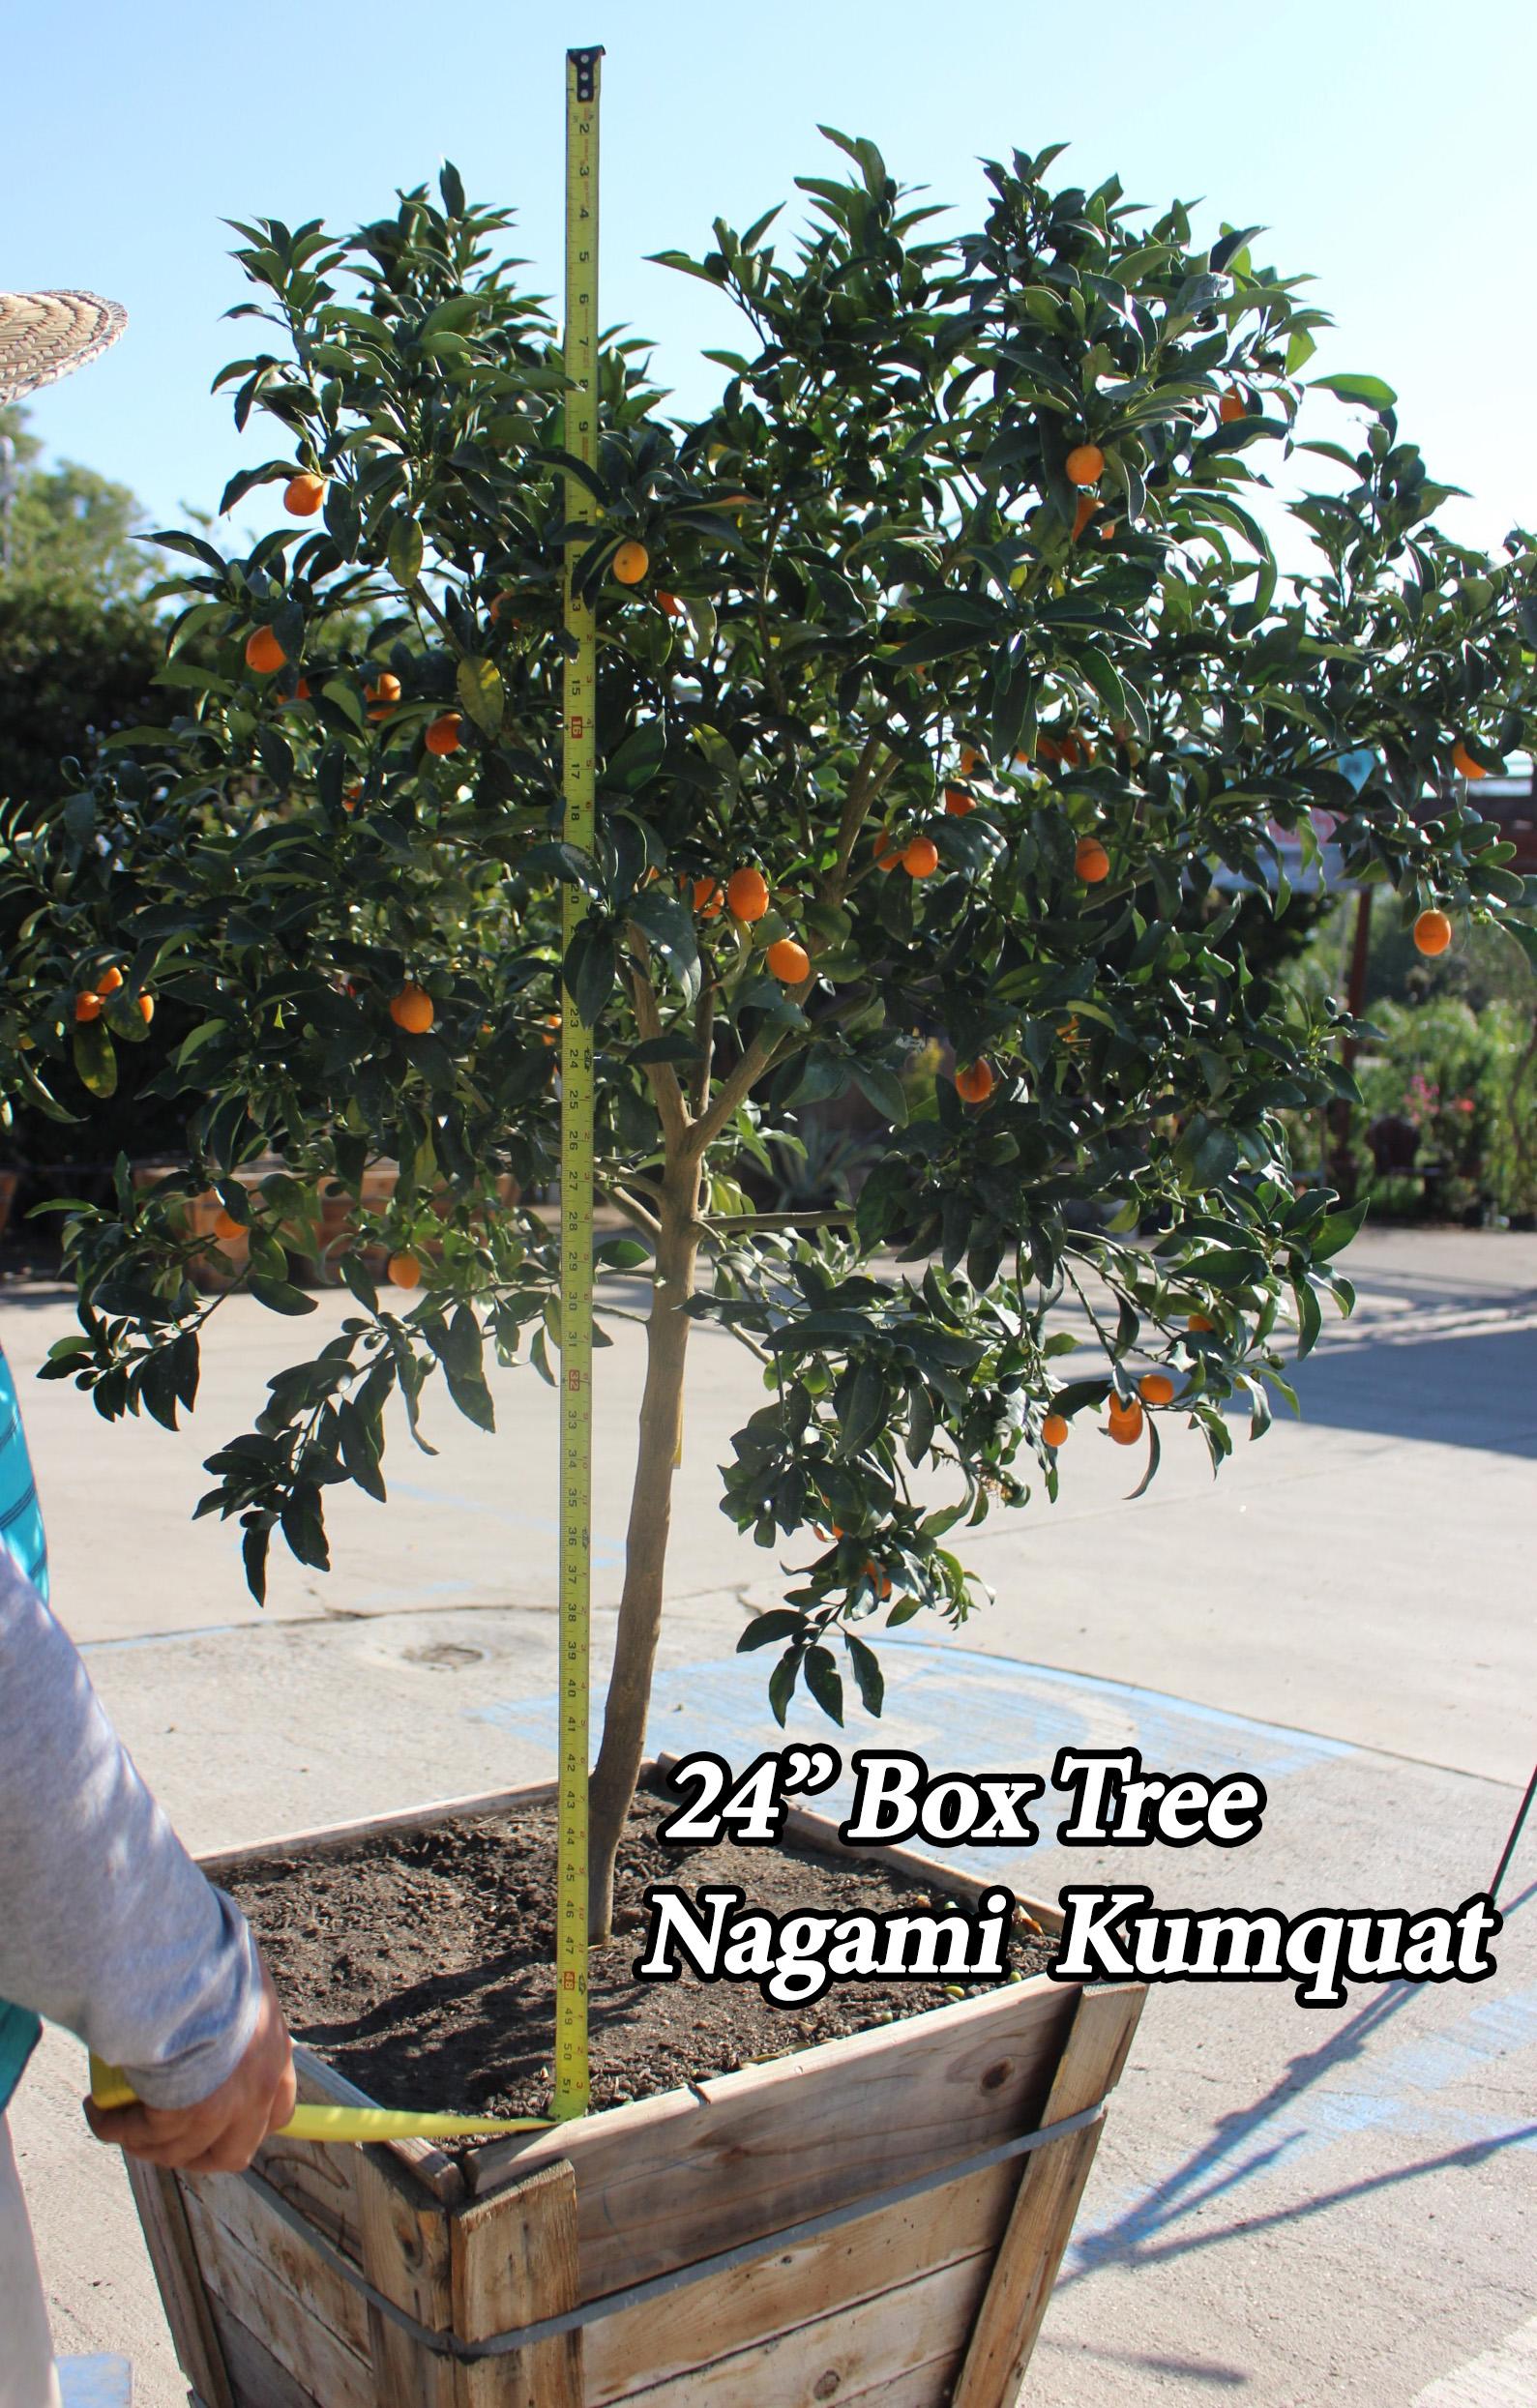 Nagami Kumquat Trees